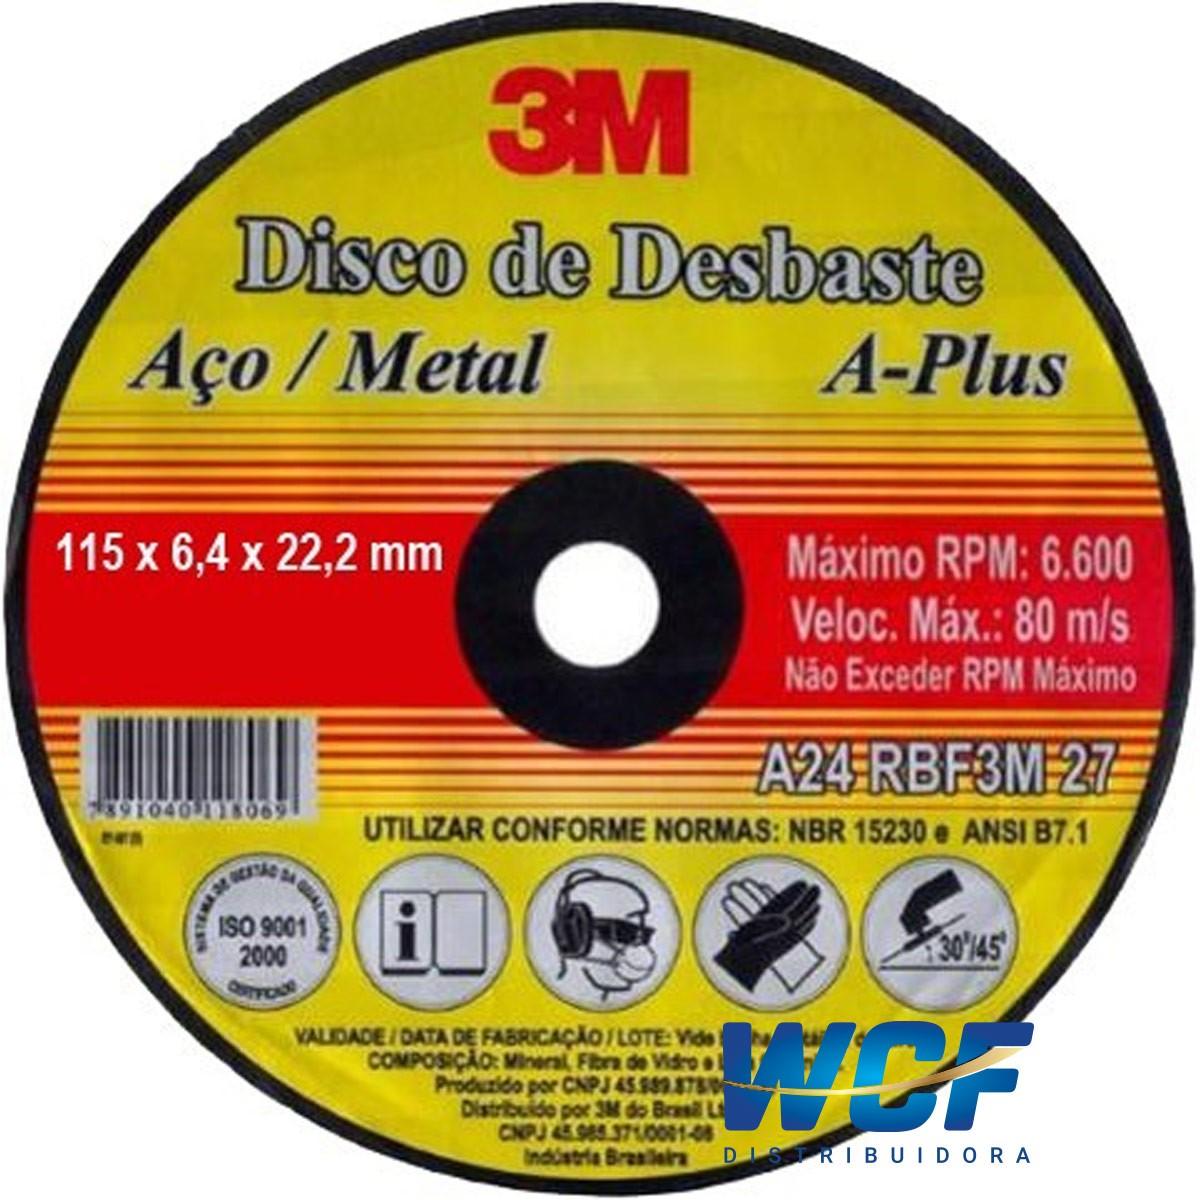 3M DISCO DESBASTE PEDRA